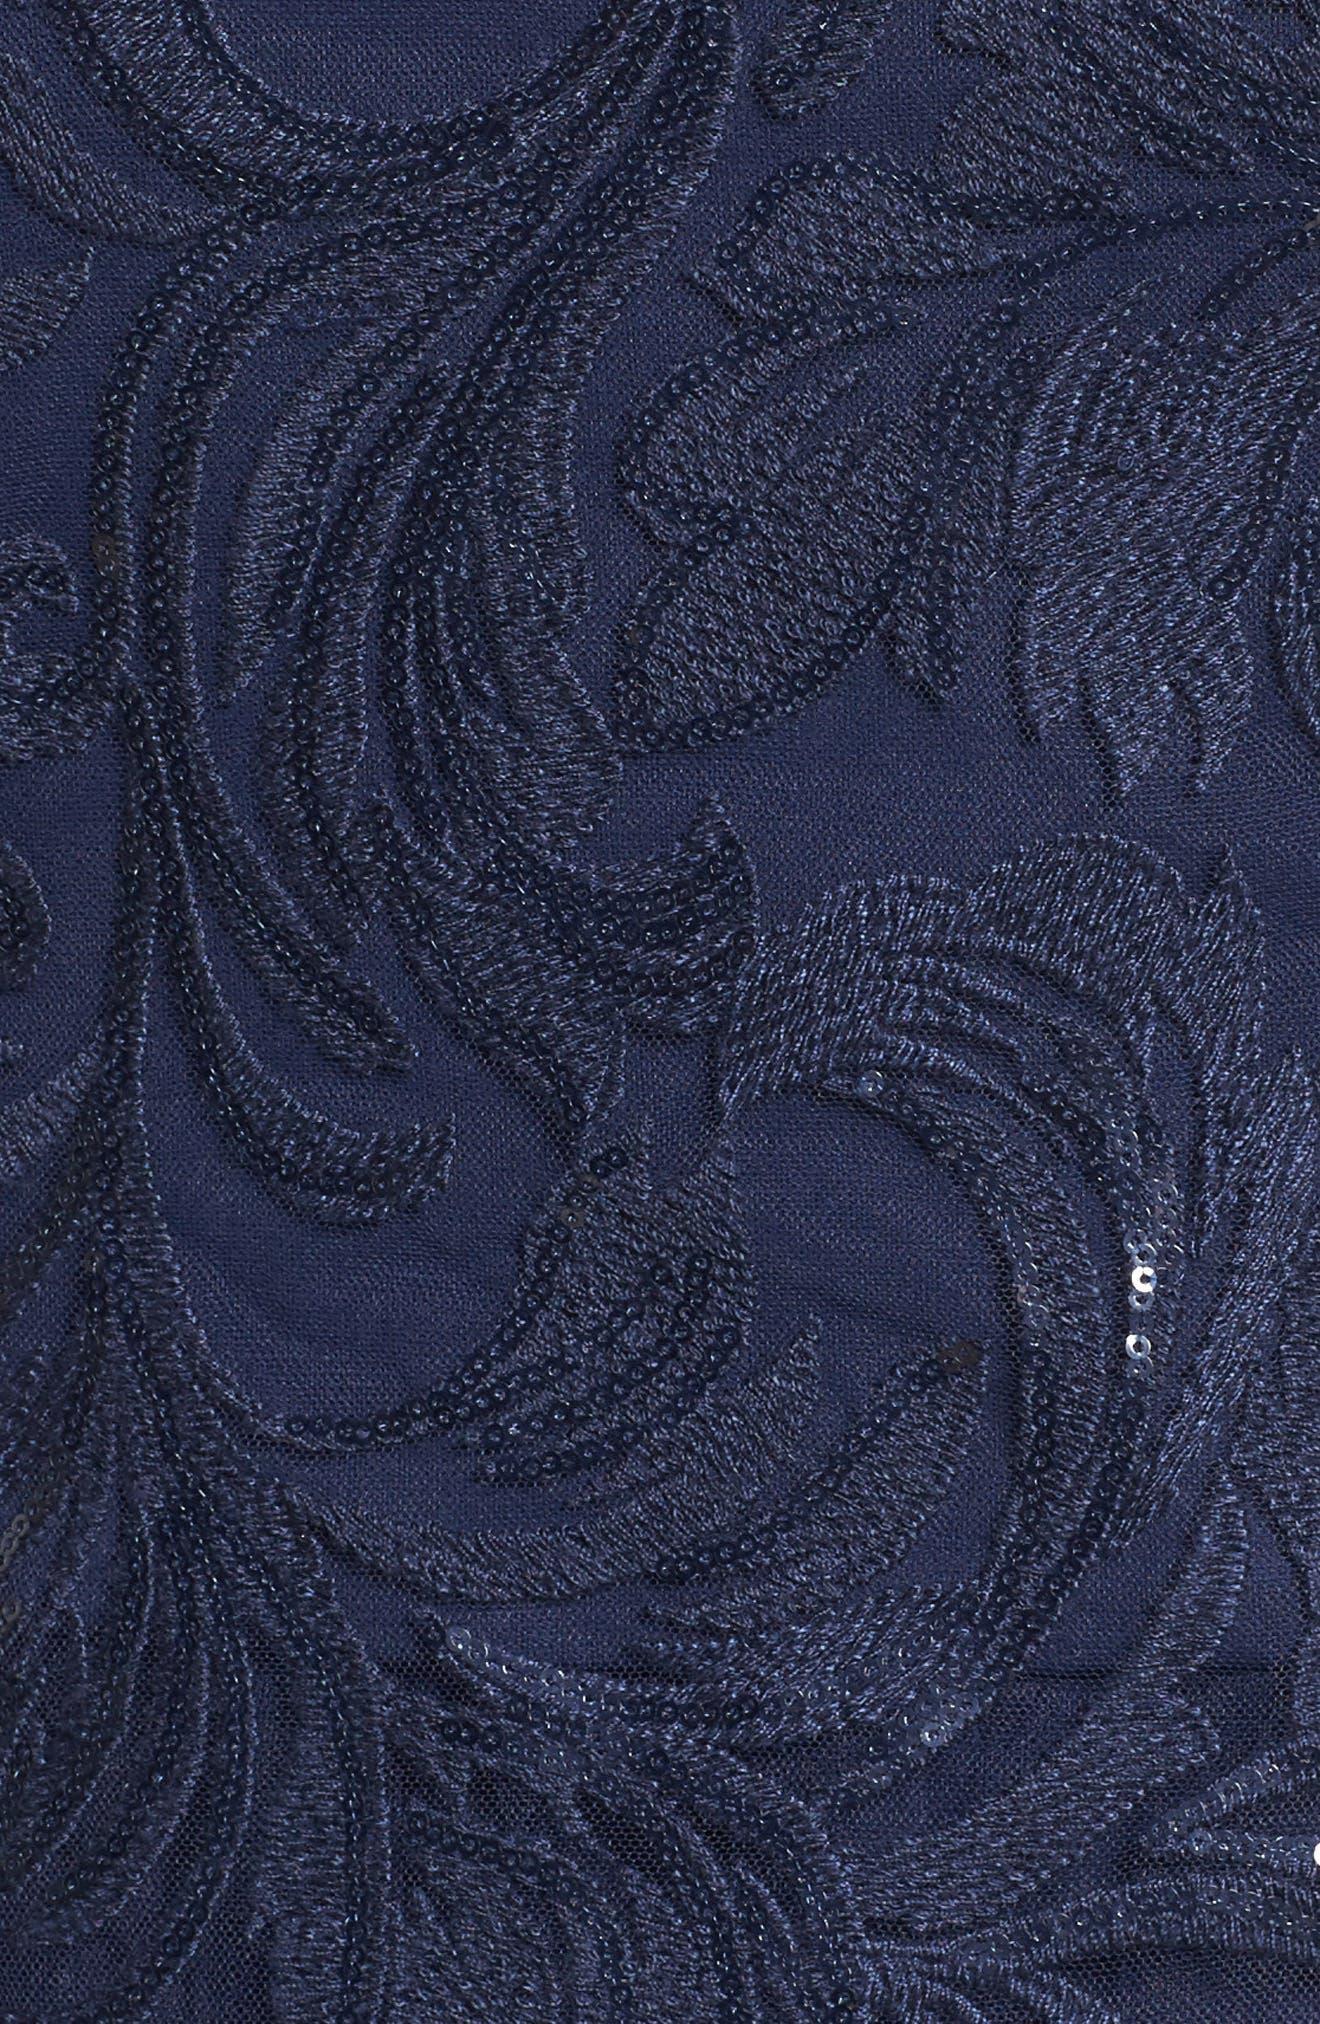 Sequin Bodice Gown,                             Alternate thumbnail 5, color,                             410